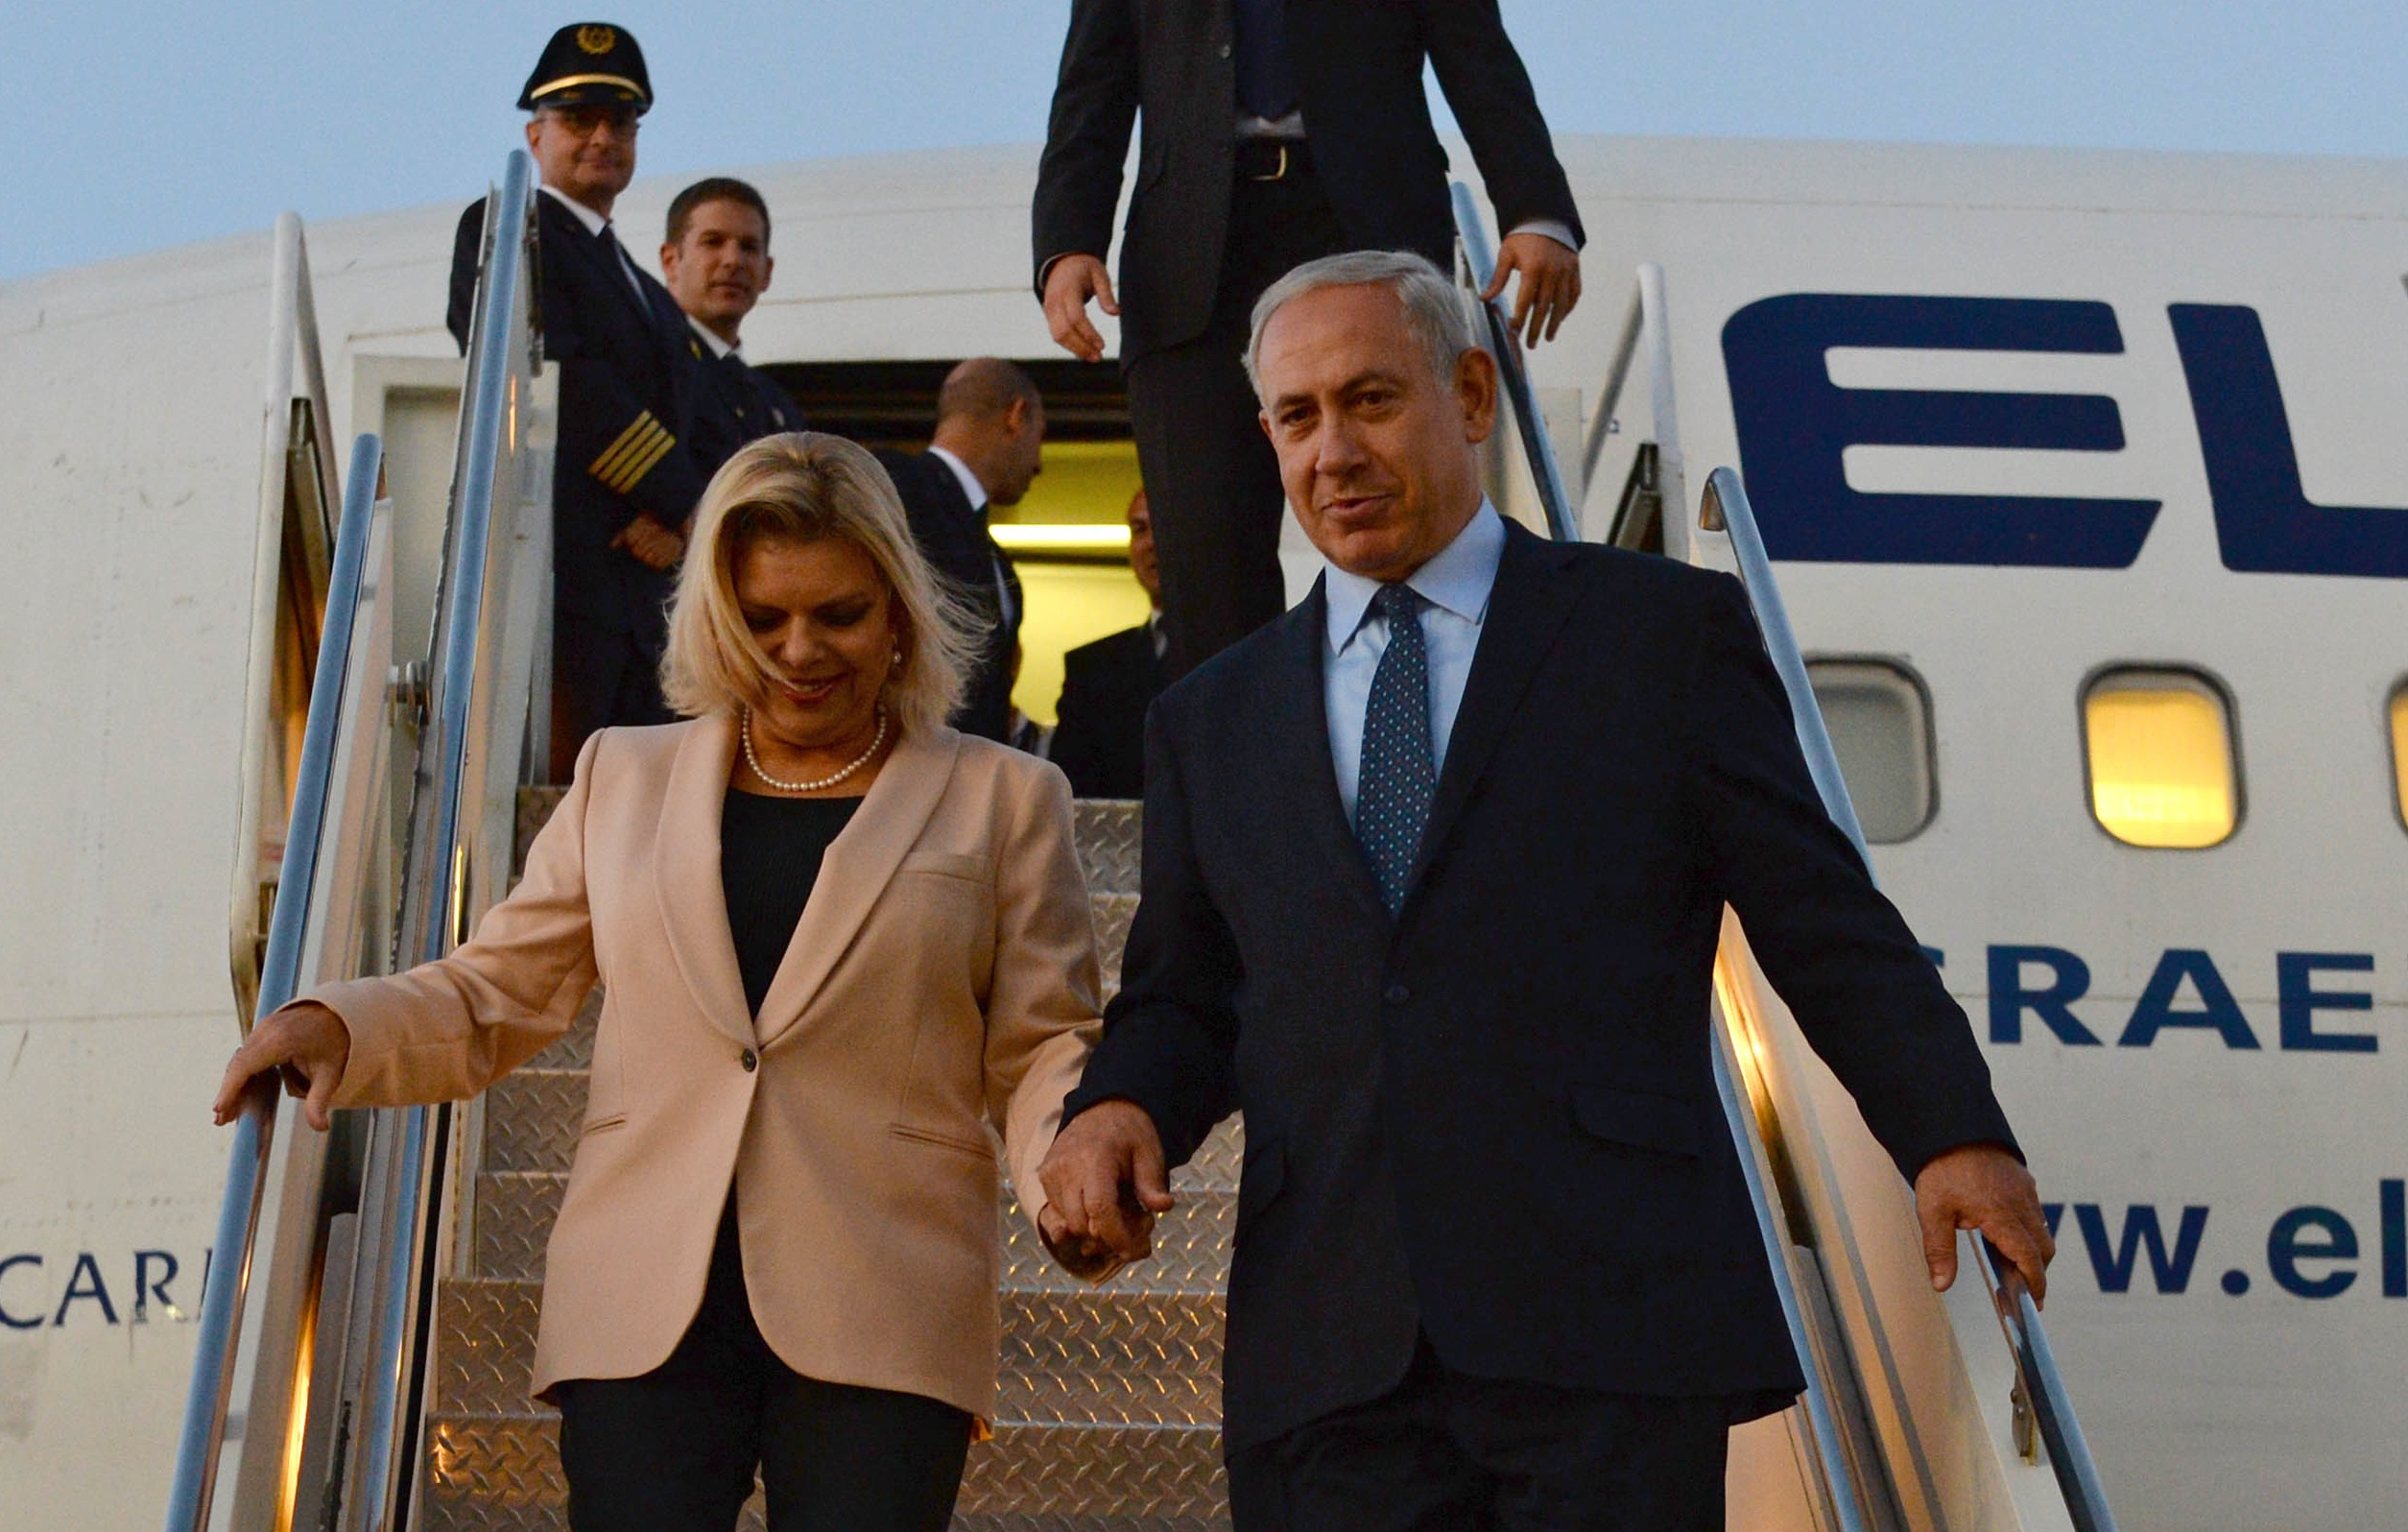 Israeli Prime Minister Benjamin Netanyahu and his wife Sarah arrive in New York, Sept. 29, 2013. (Kobi Gideon/GPO/Flash90)